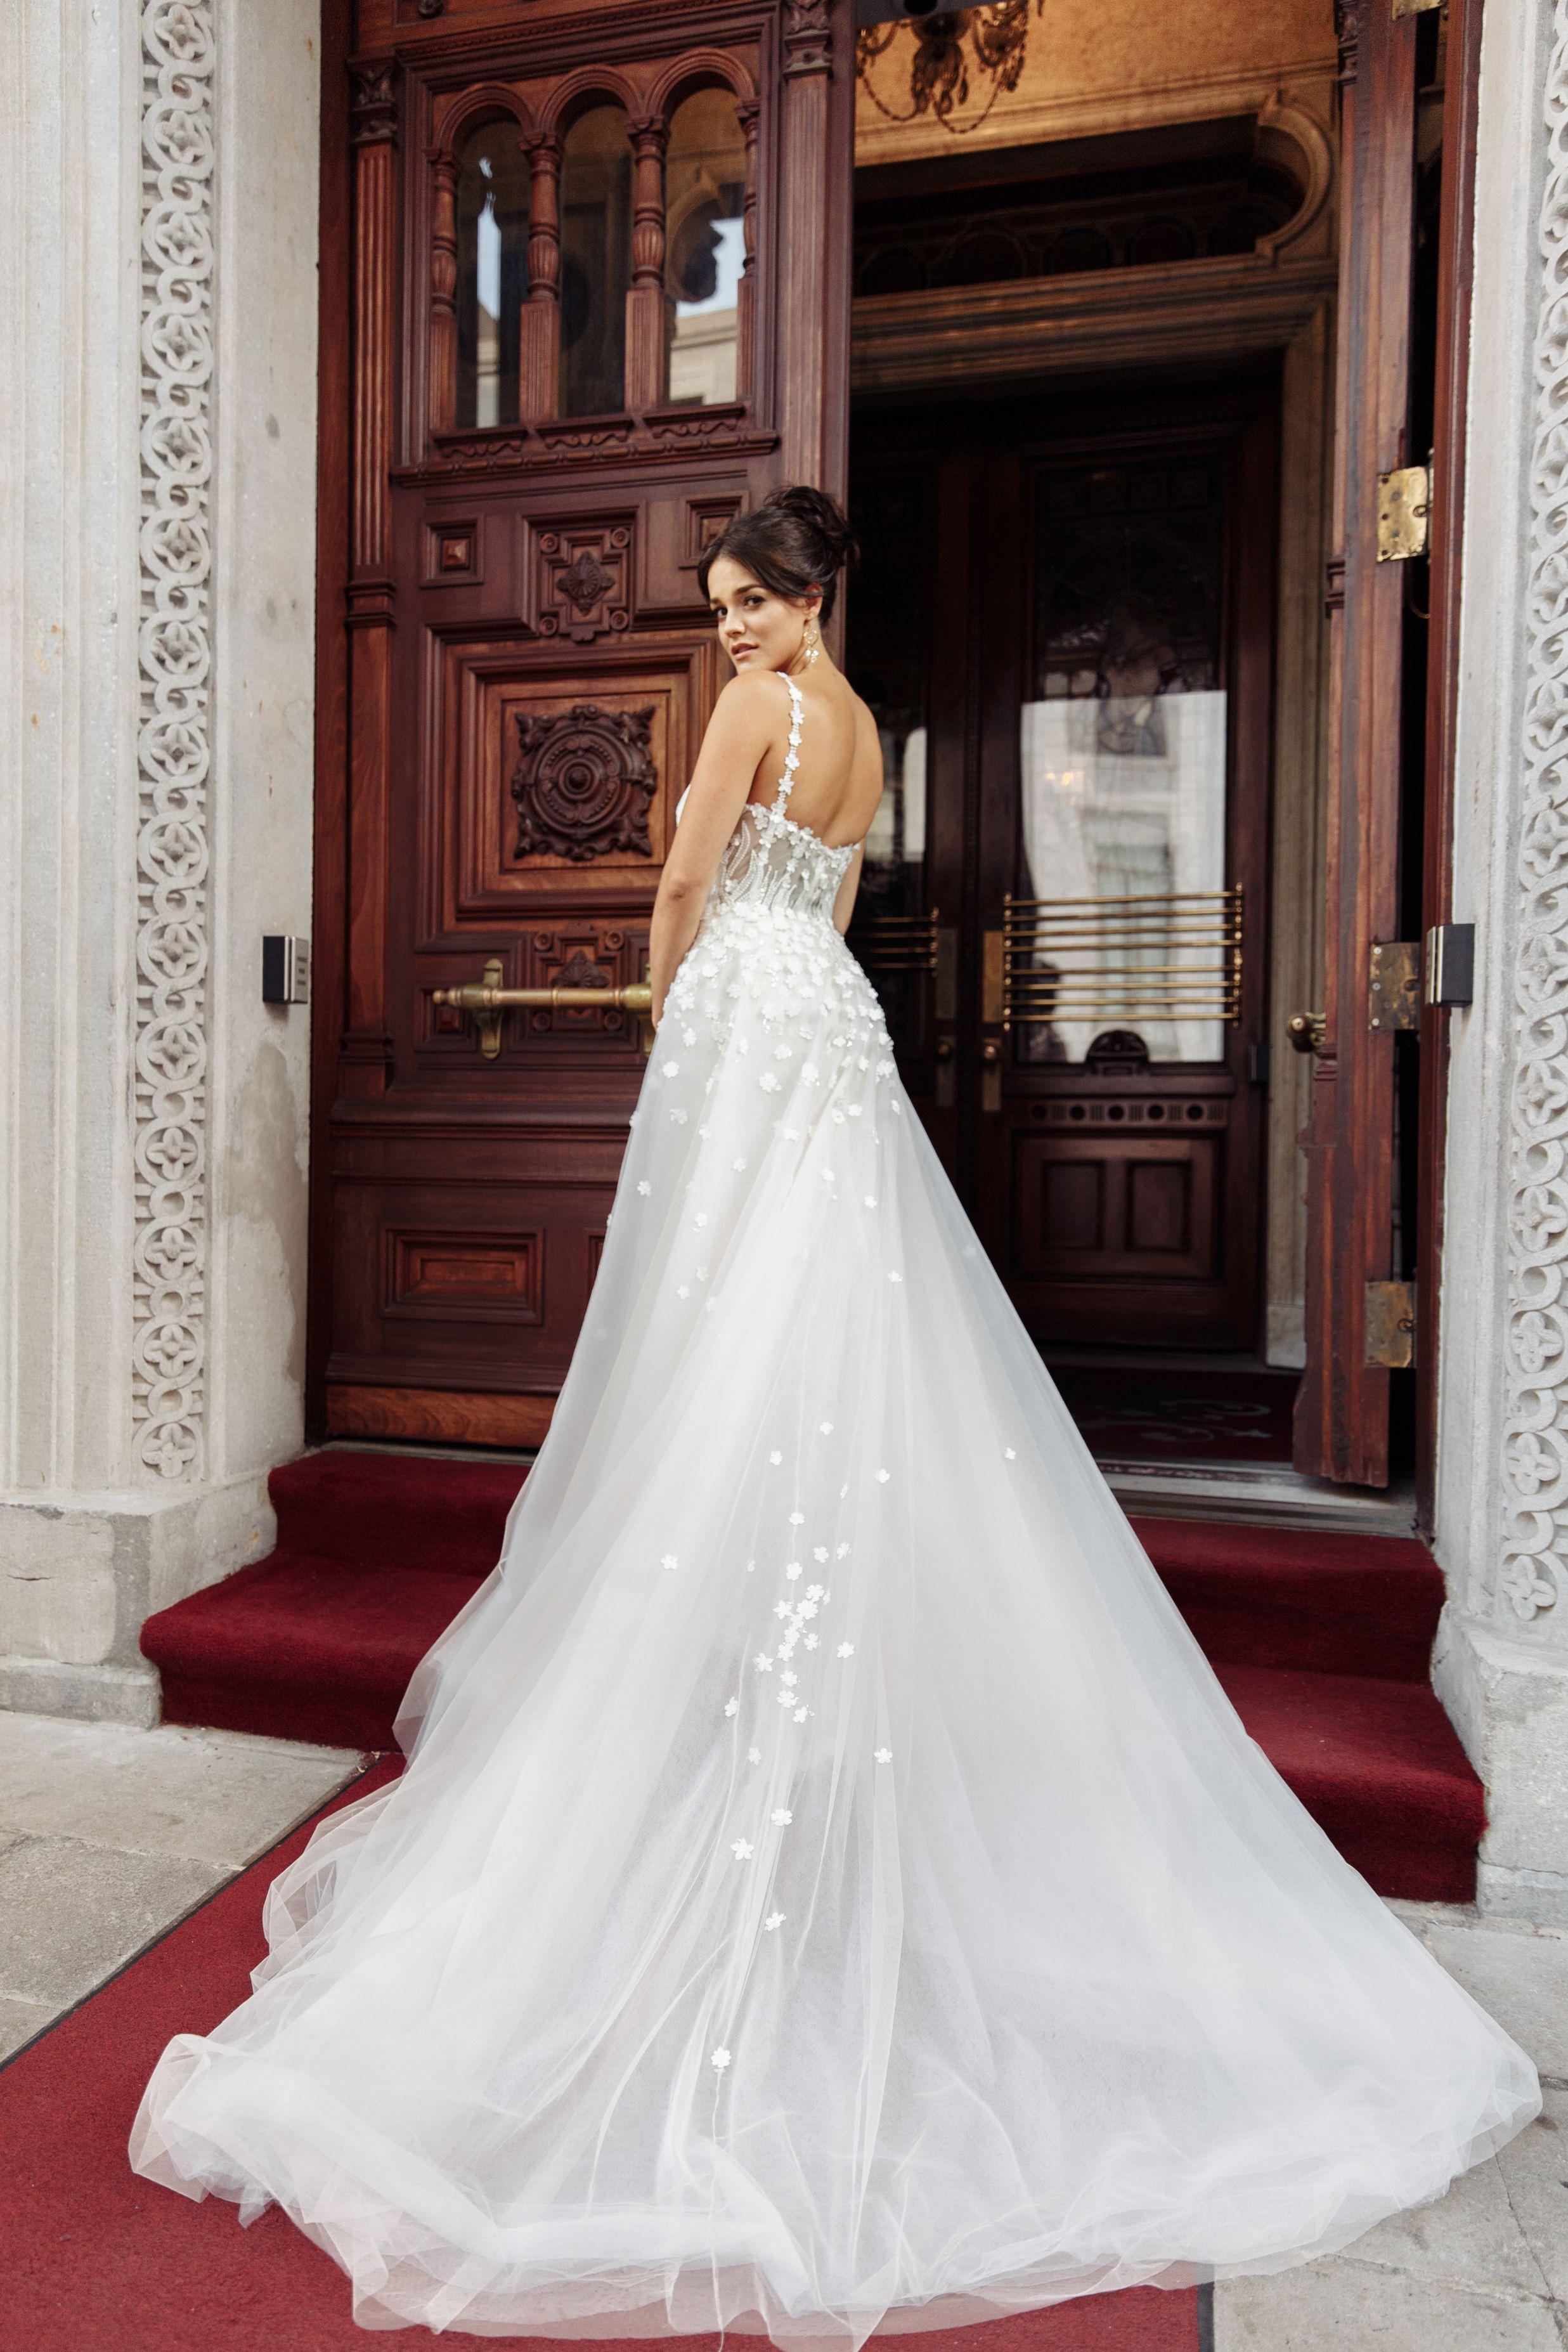 detachable skirt wedding dresses montreal lilia haute couture wedding gown designer